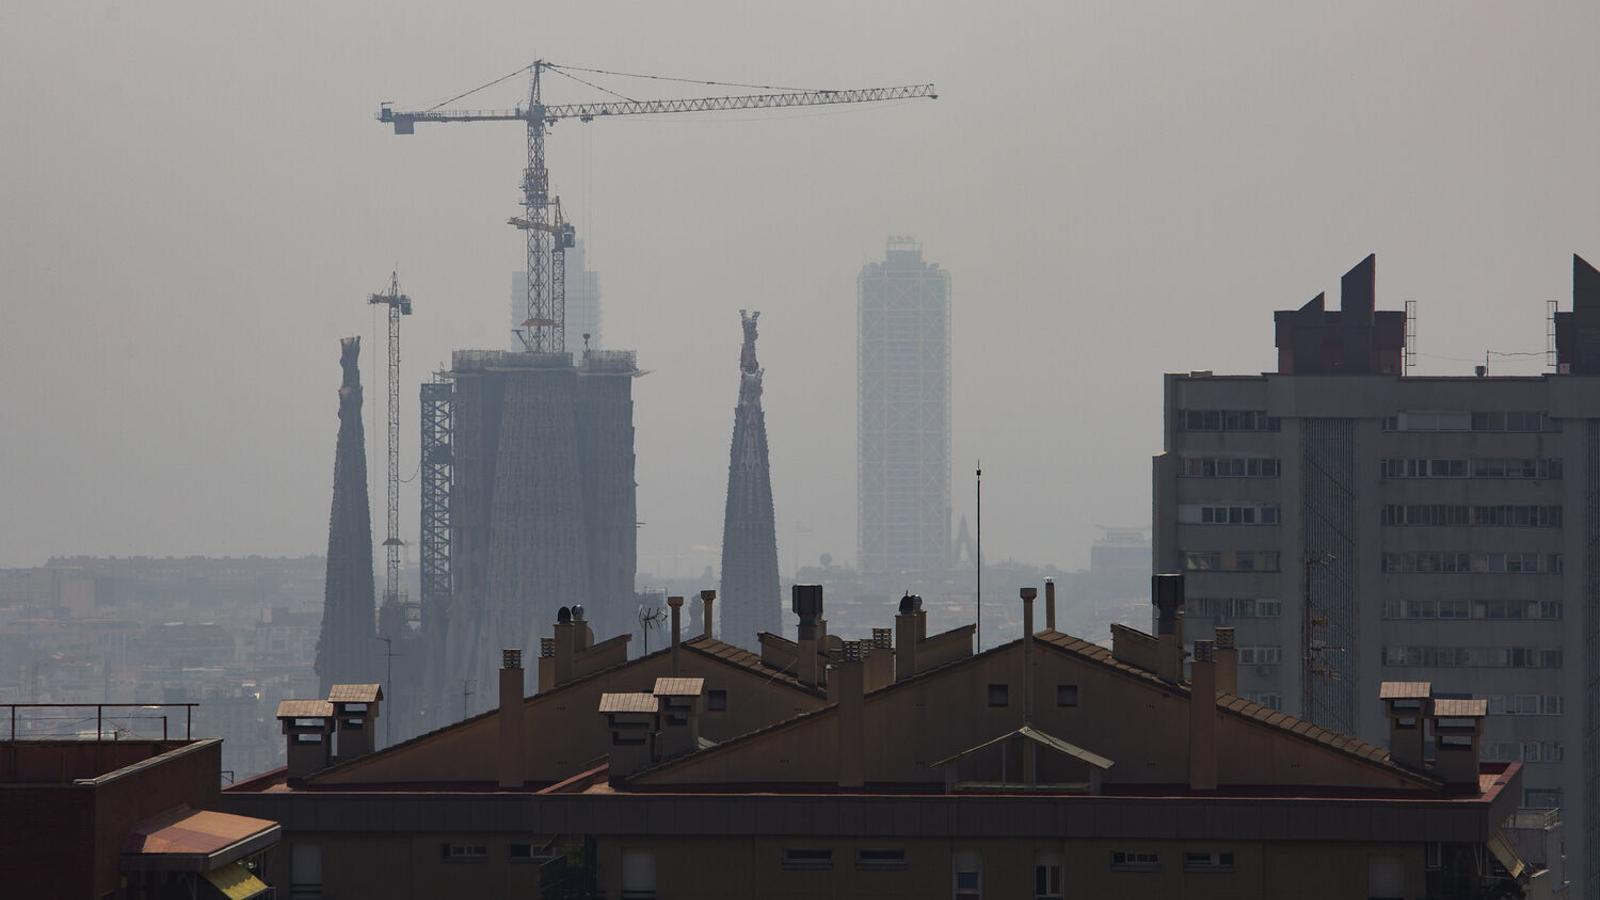 Barcelona enmig de la 'boira' de contaminació per partícules en suspensió.